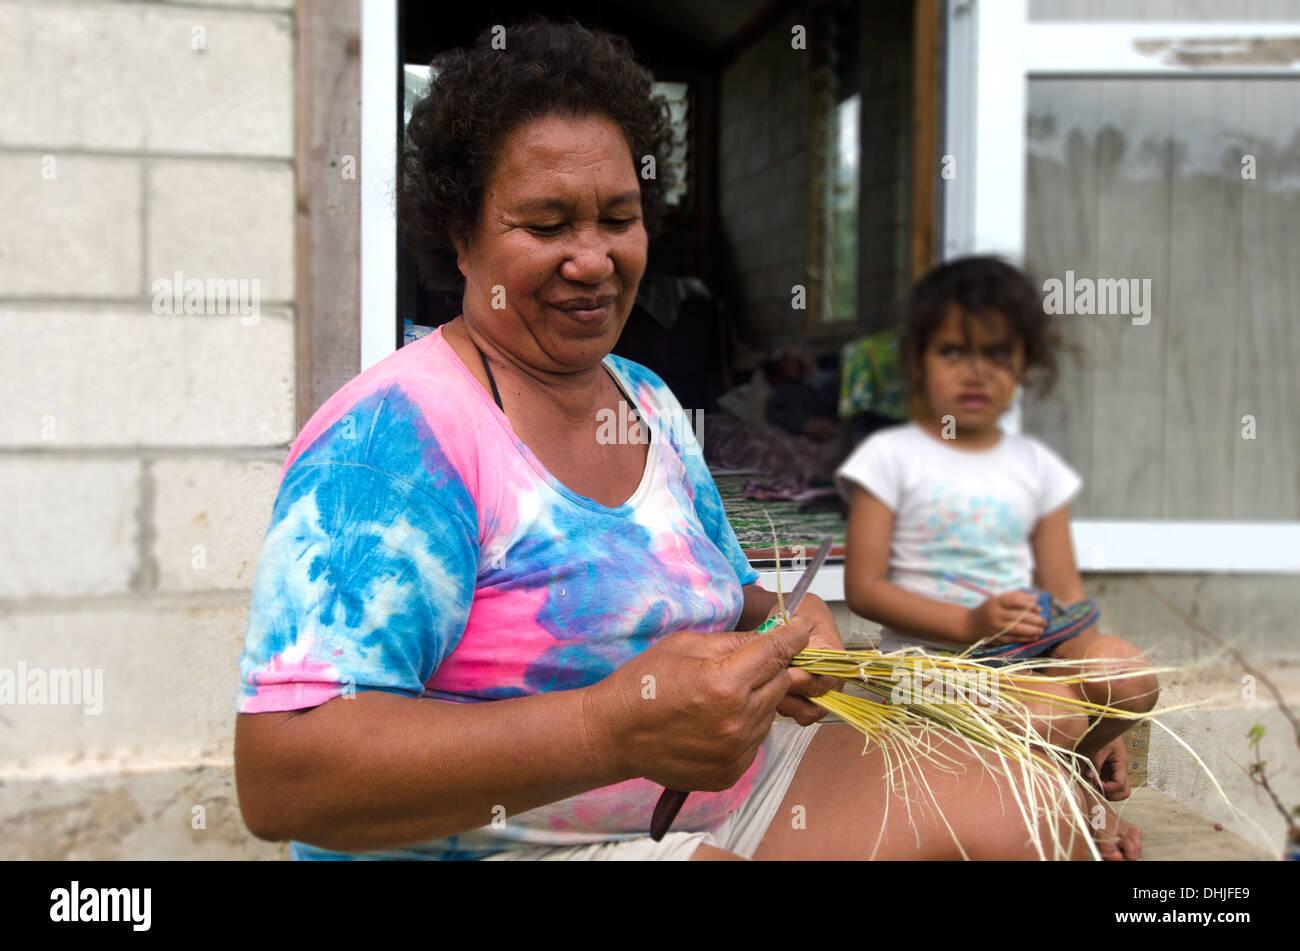 Cook Islanders family in Aitutaki lagoon Cook Island - Stock Image